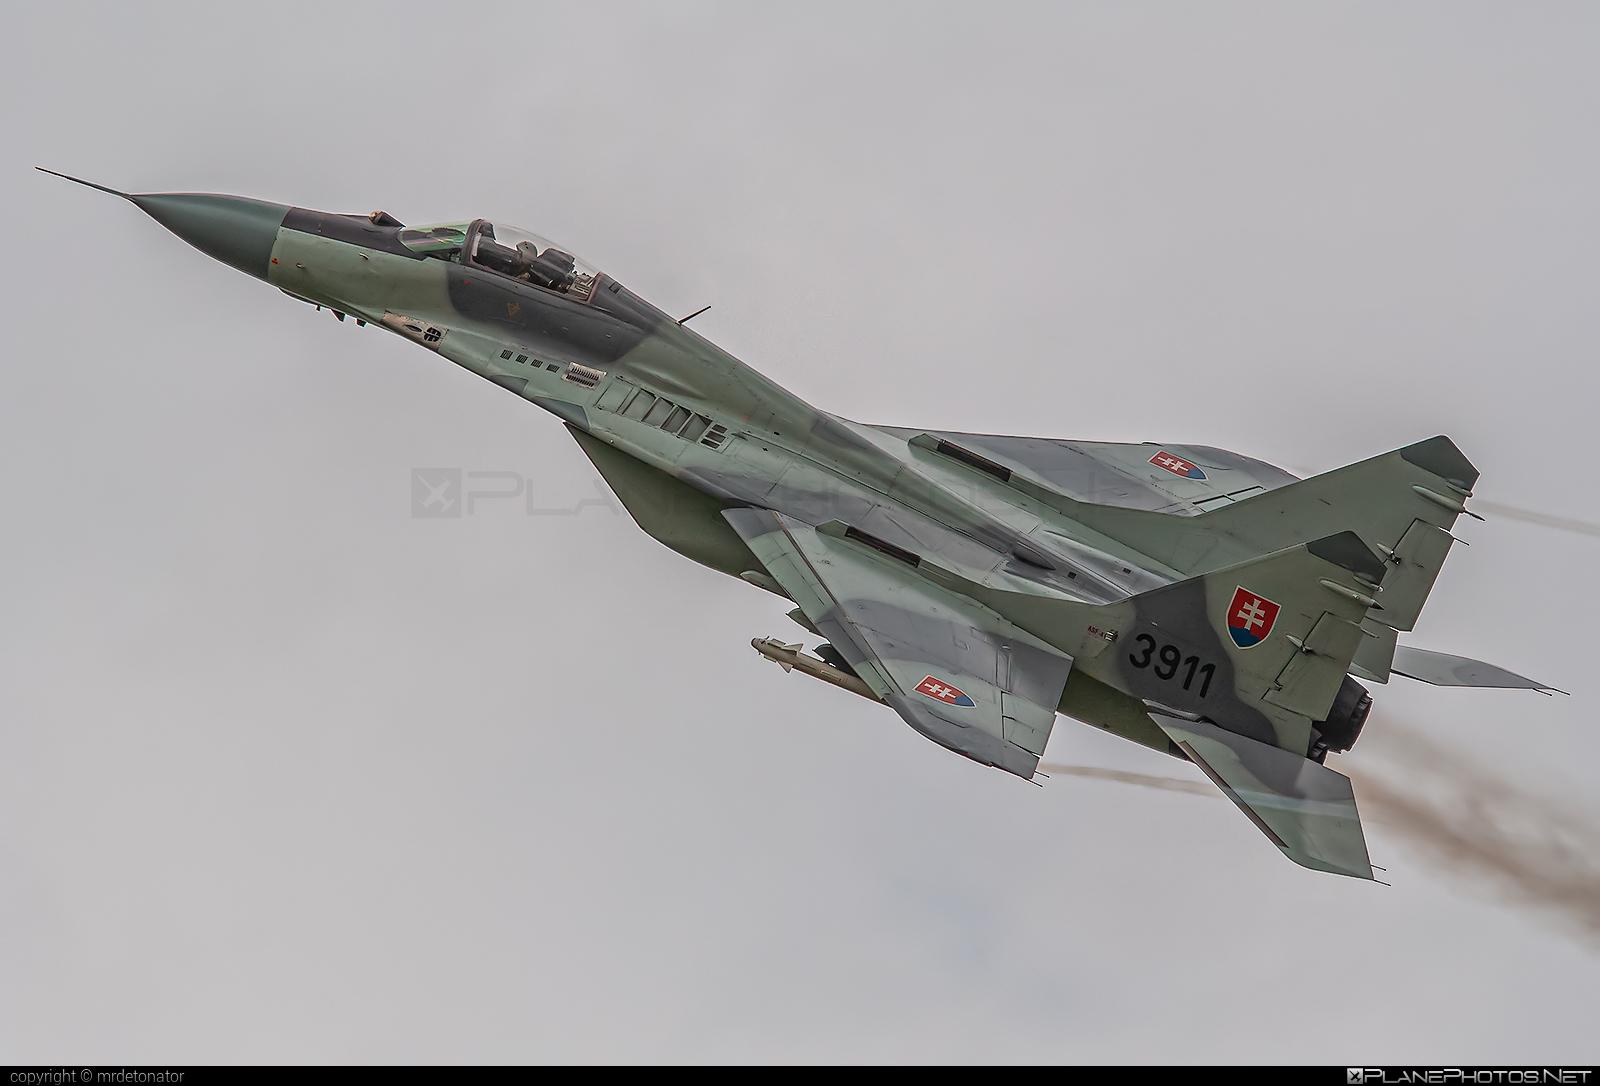 Mikoyan-Gurevich MiG-29A - 3911 operated by Vzdušné sily OS SR (Slovak Air Force) #mig #mig29 #mig29a #mikoyangurevich #slovakairforce #vzdusnesilyossr